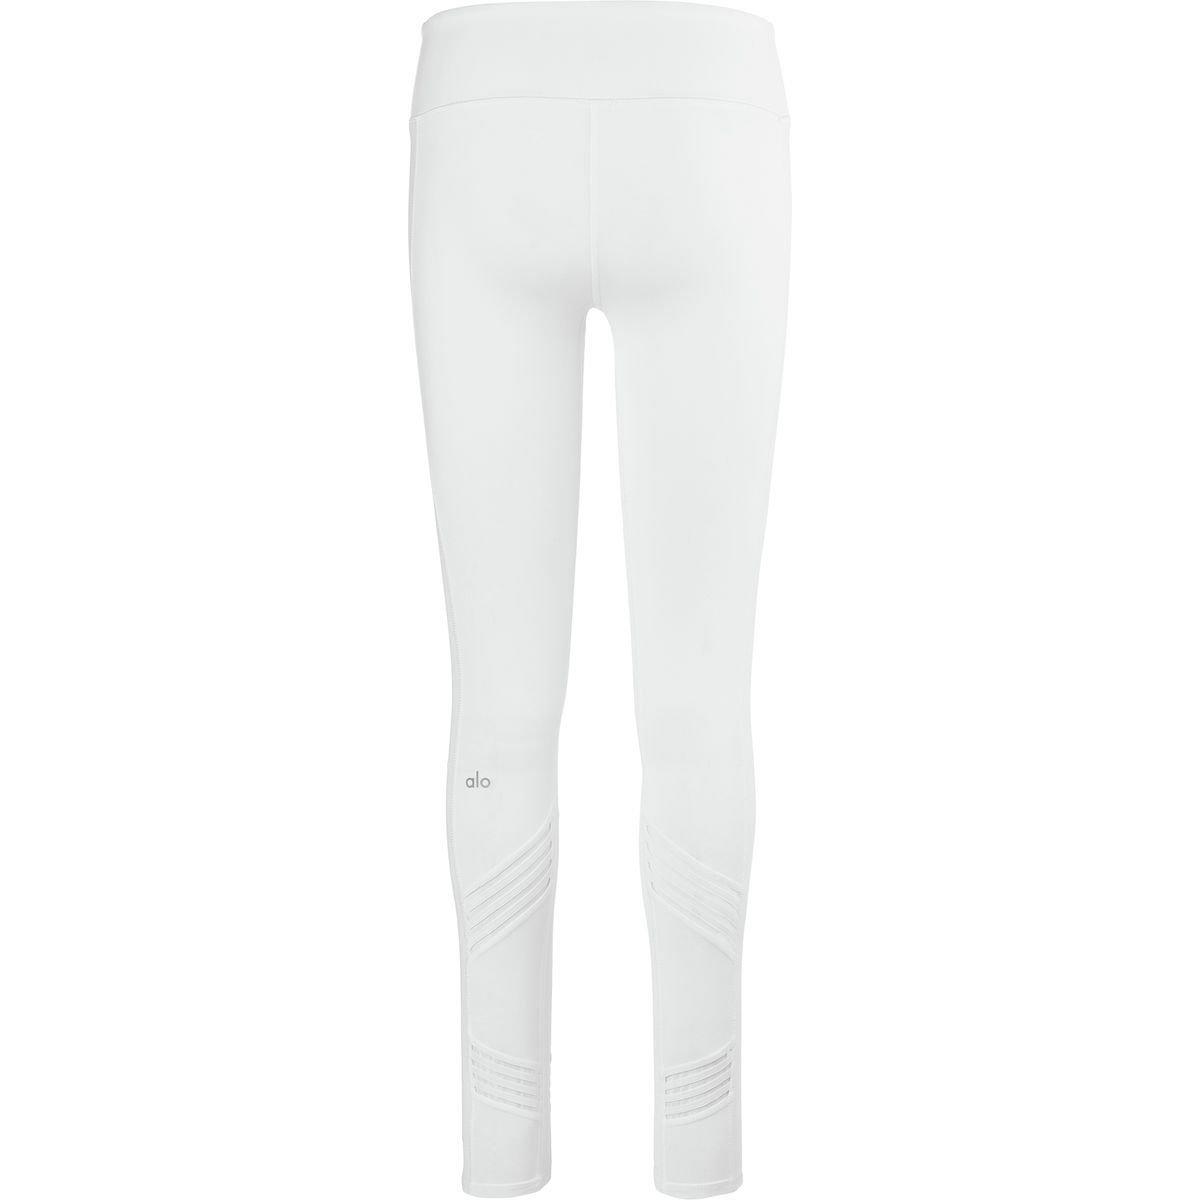 Alo Yoga Womens Multi Legging W5584R-WHT-L